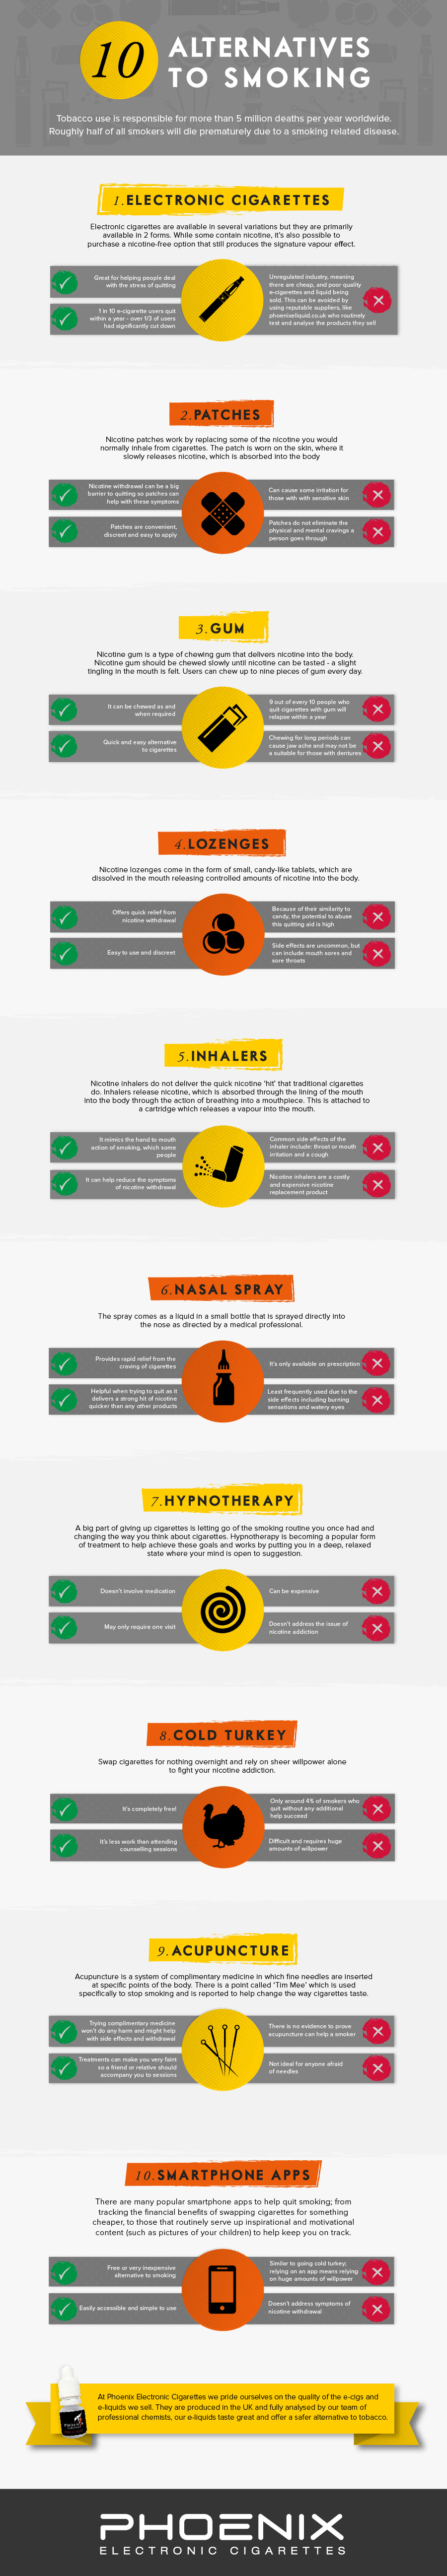 10-Smoking-Alternatives-Infographic)